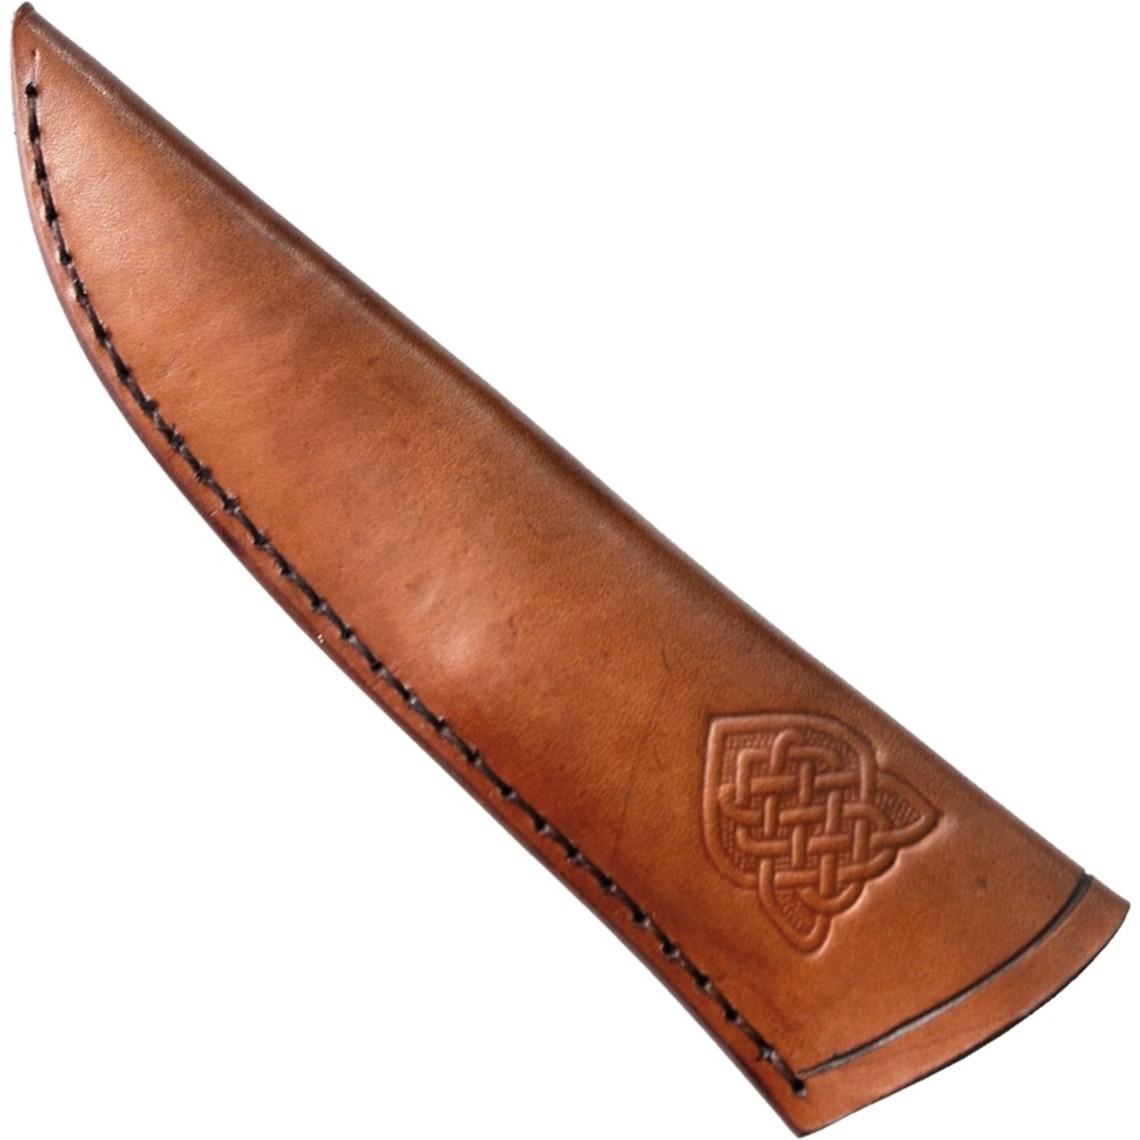 Citadel Tumba cuchillo nórdico